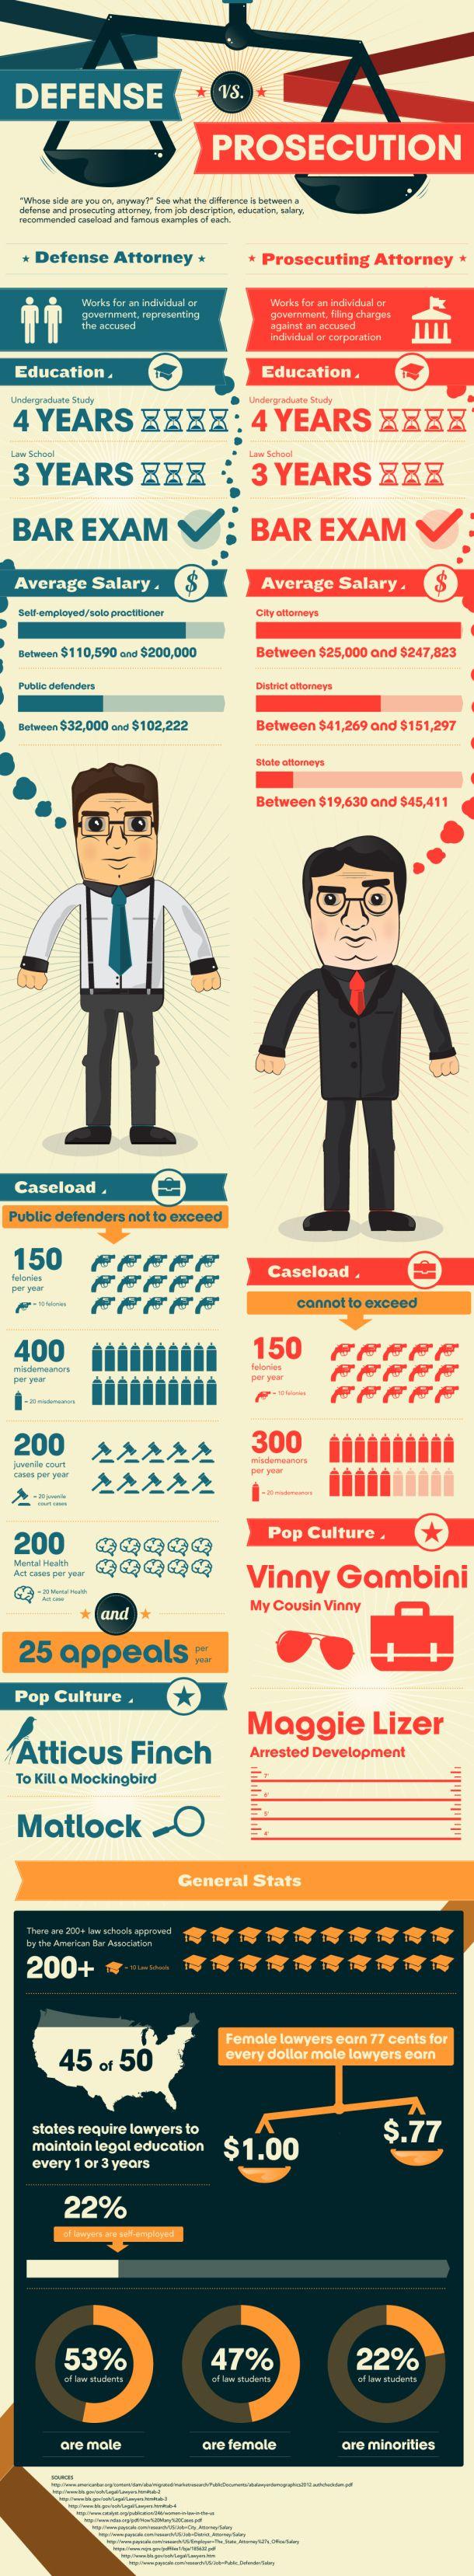 Defense vs. Prosecution [INFOGRAPHIC] court